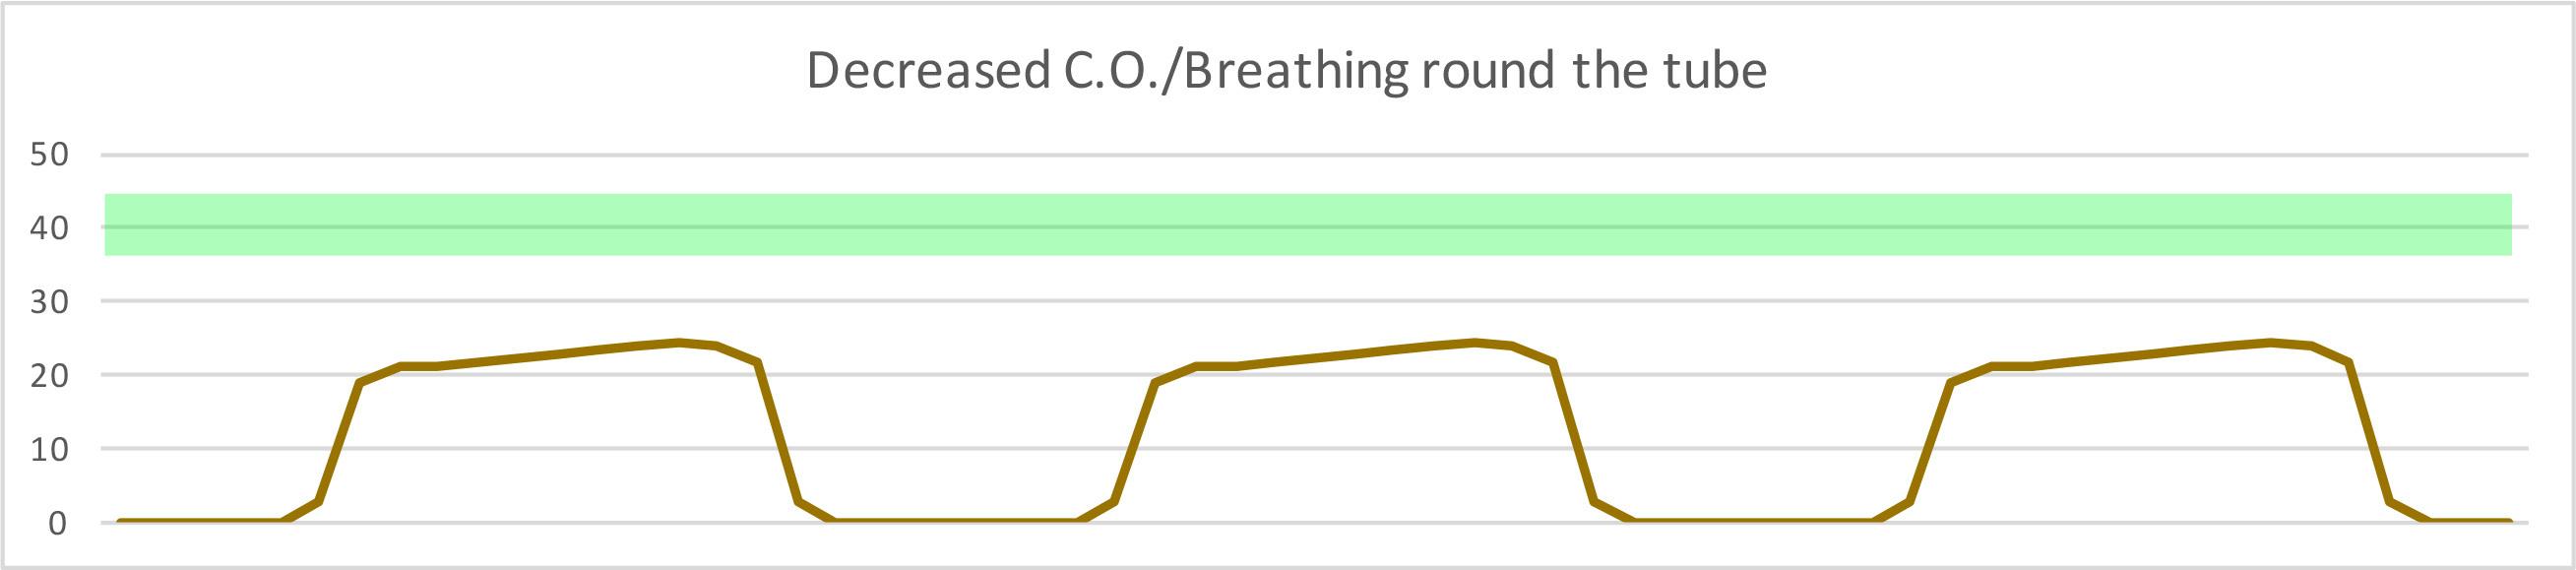 decreased-co.jpg#asset:3113